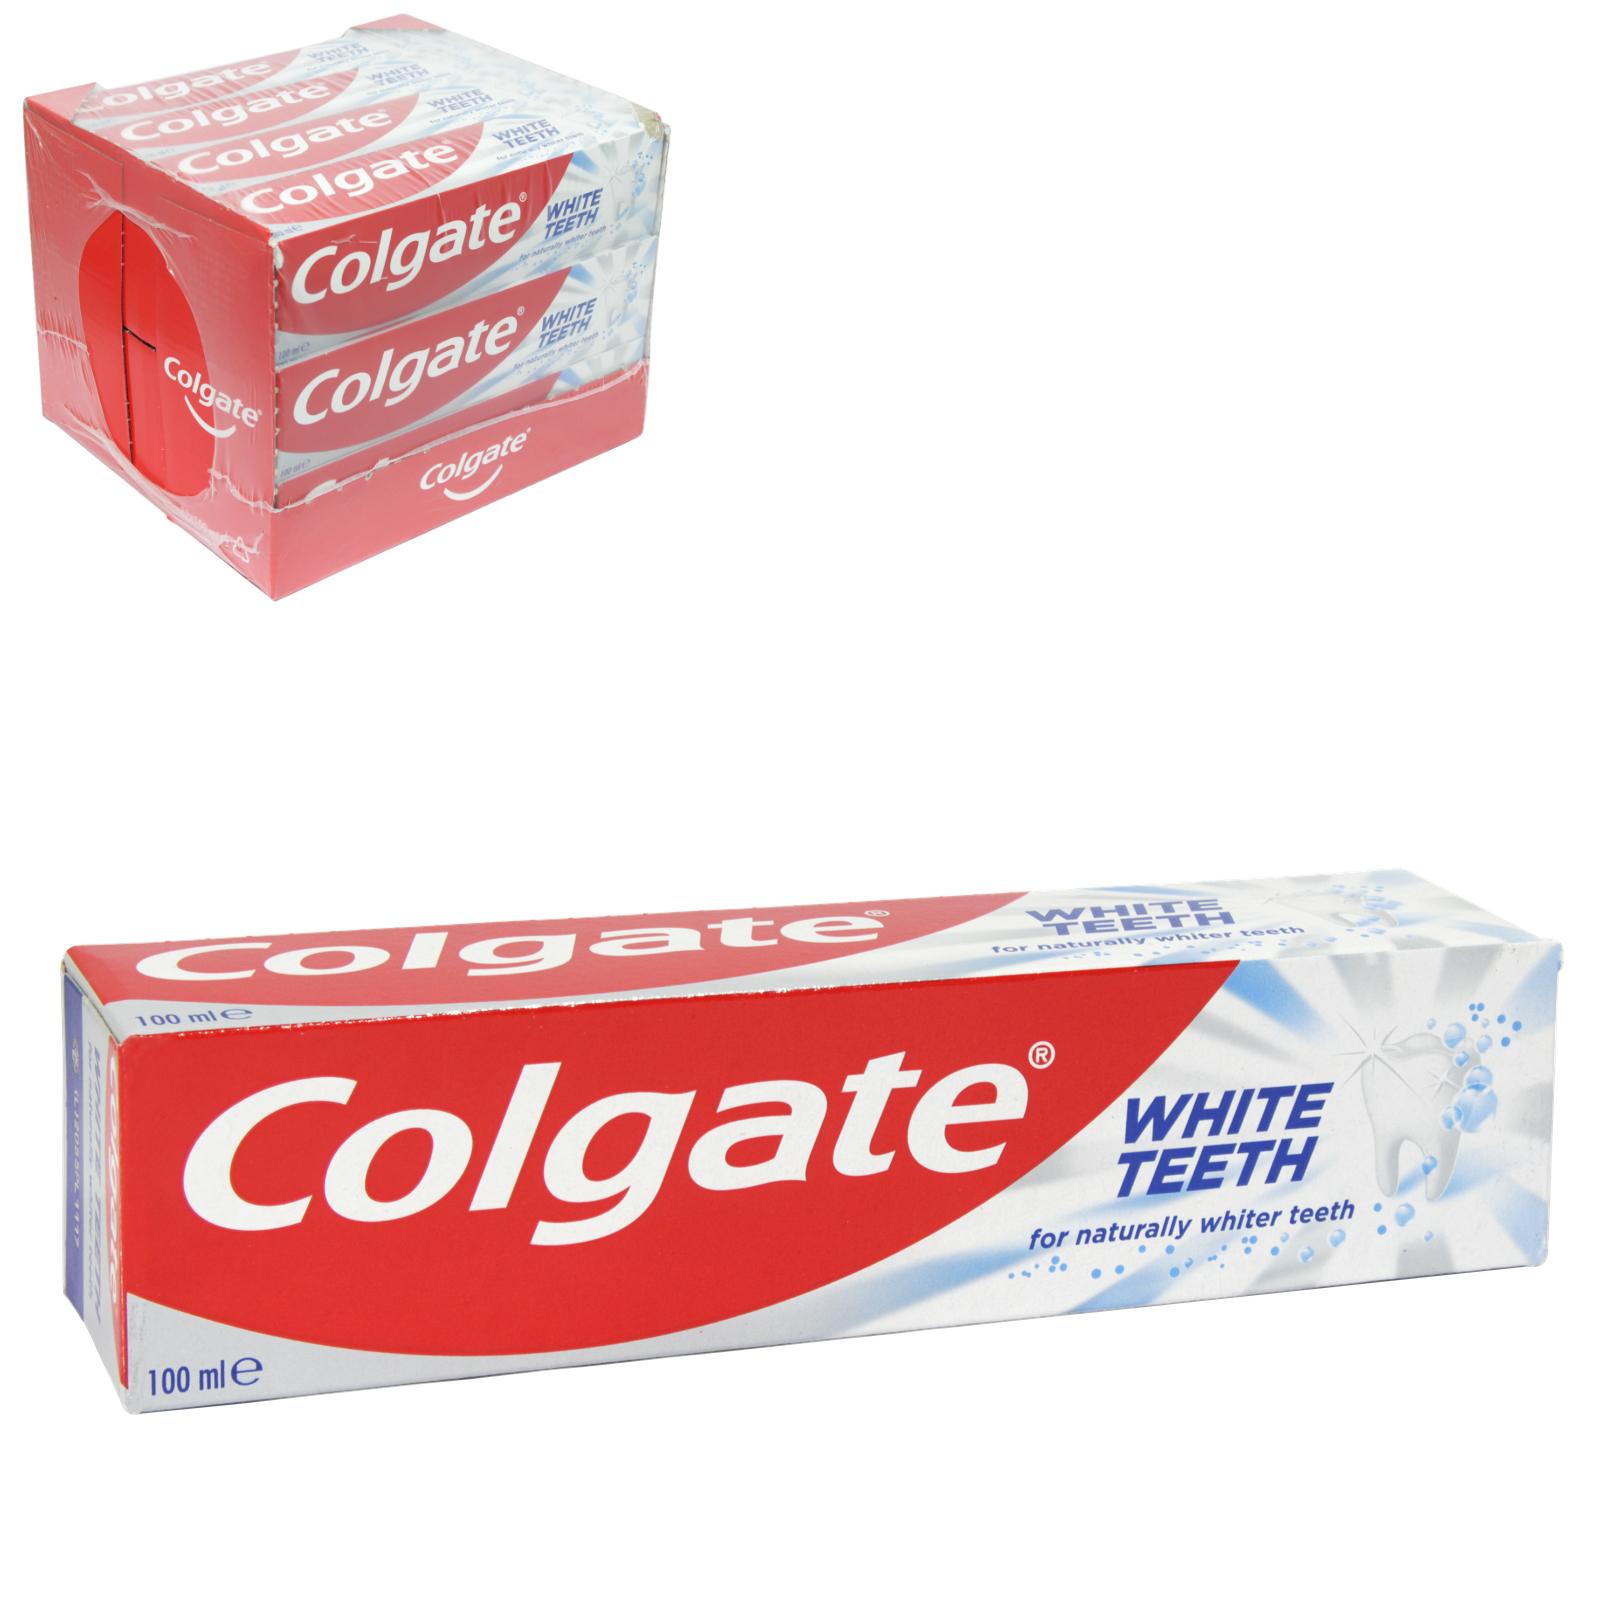 COLGATE TOOTHPASTE 100ML WHITENING X12